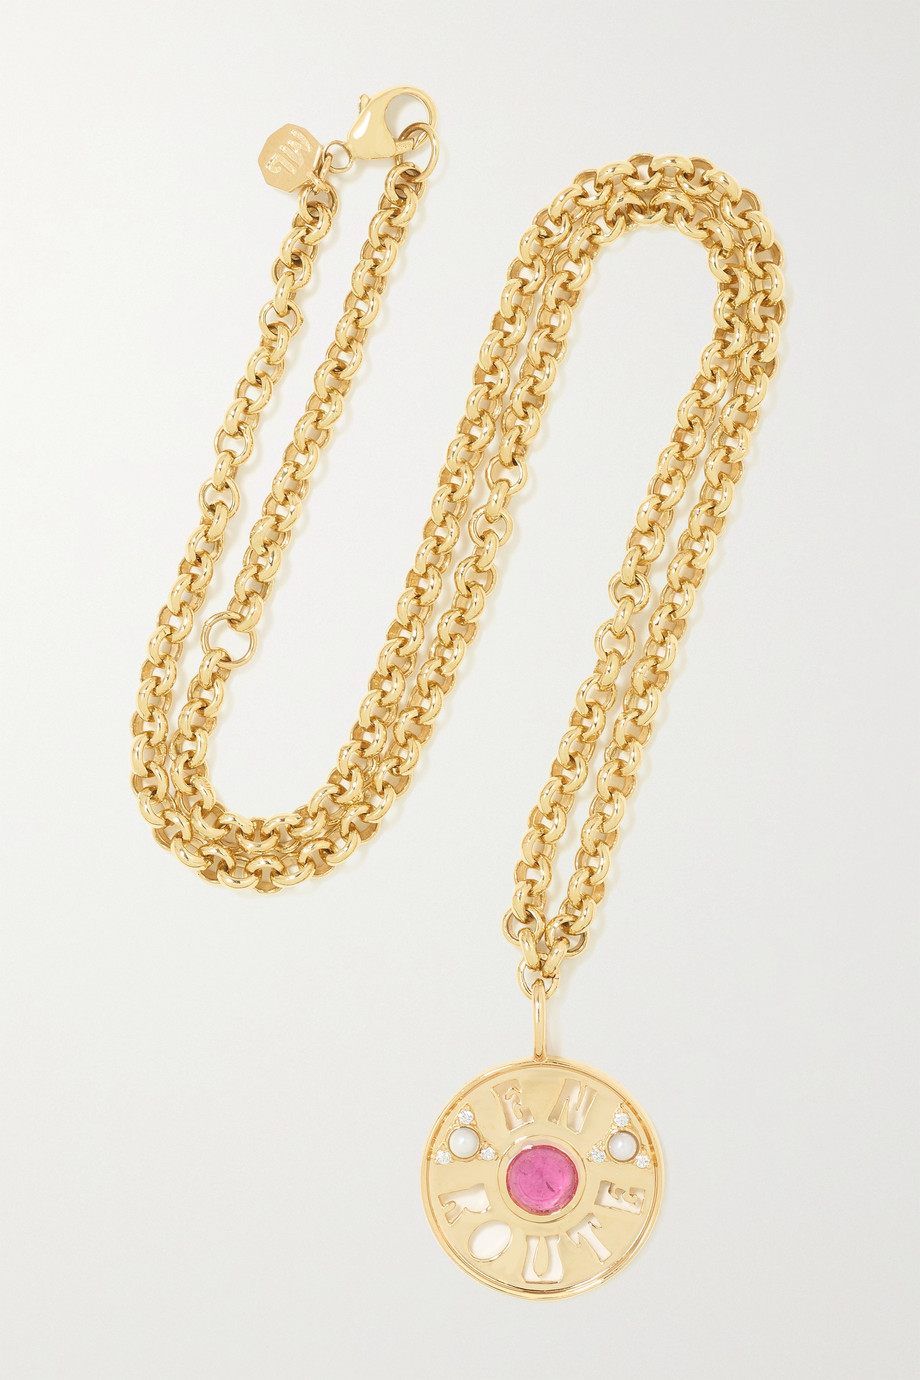 Marlo Laz En Route 14-karat gold multi-stone necklace